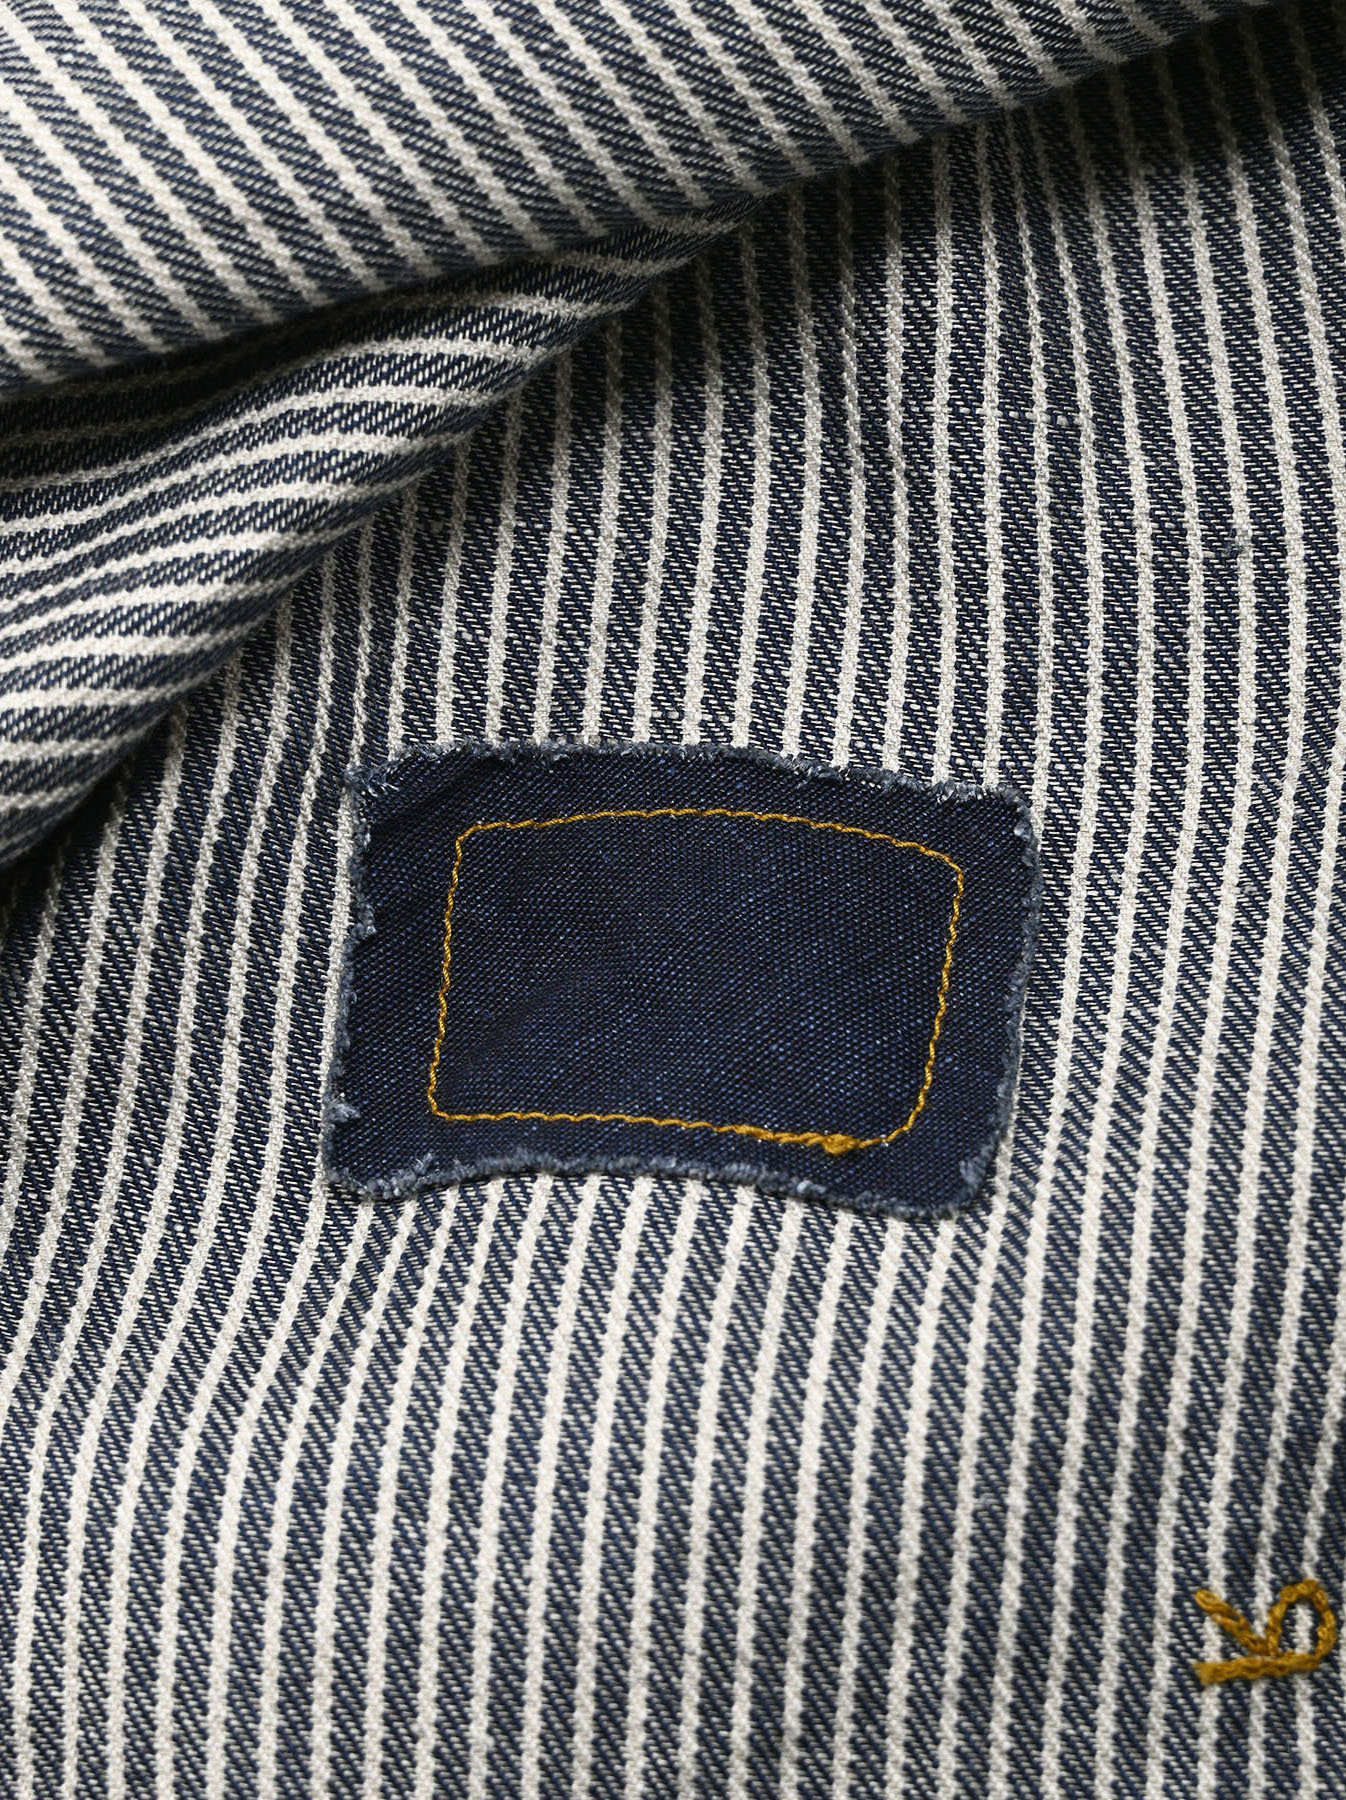 Komugi Denim Tuck Lace T-shirt-11